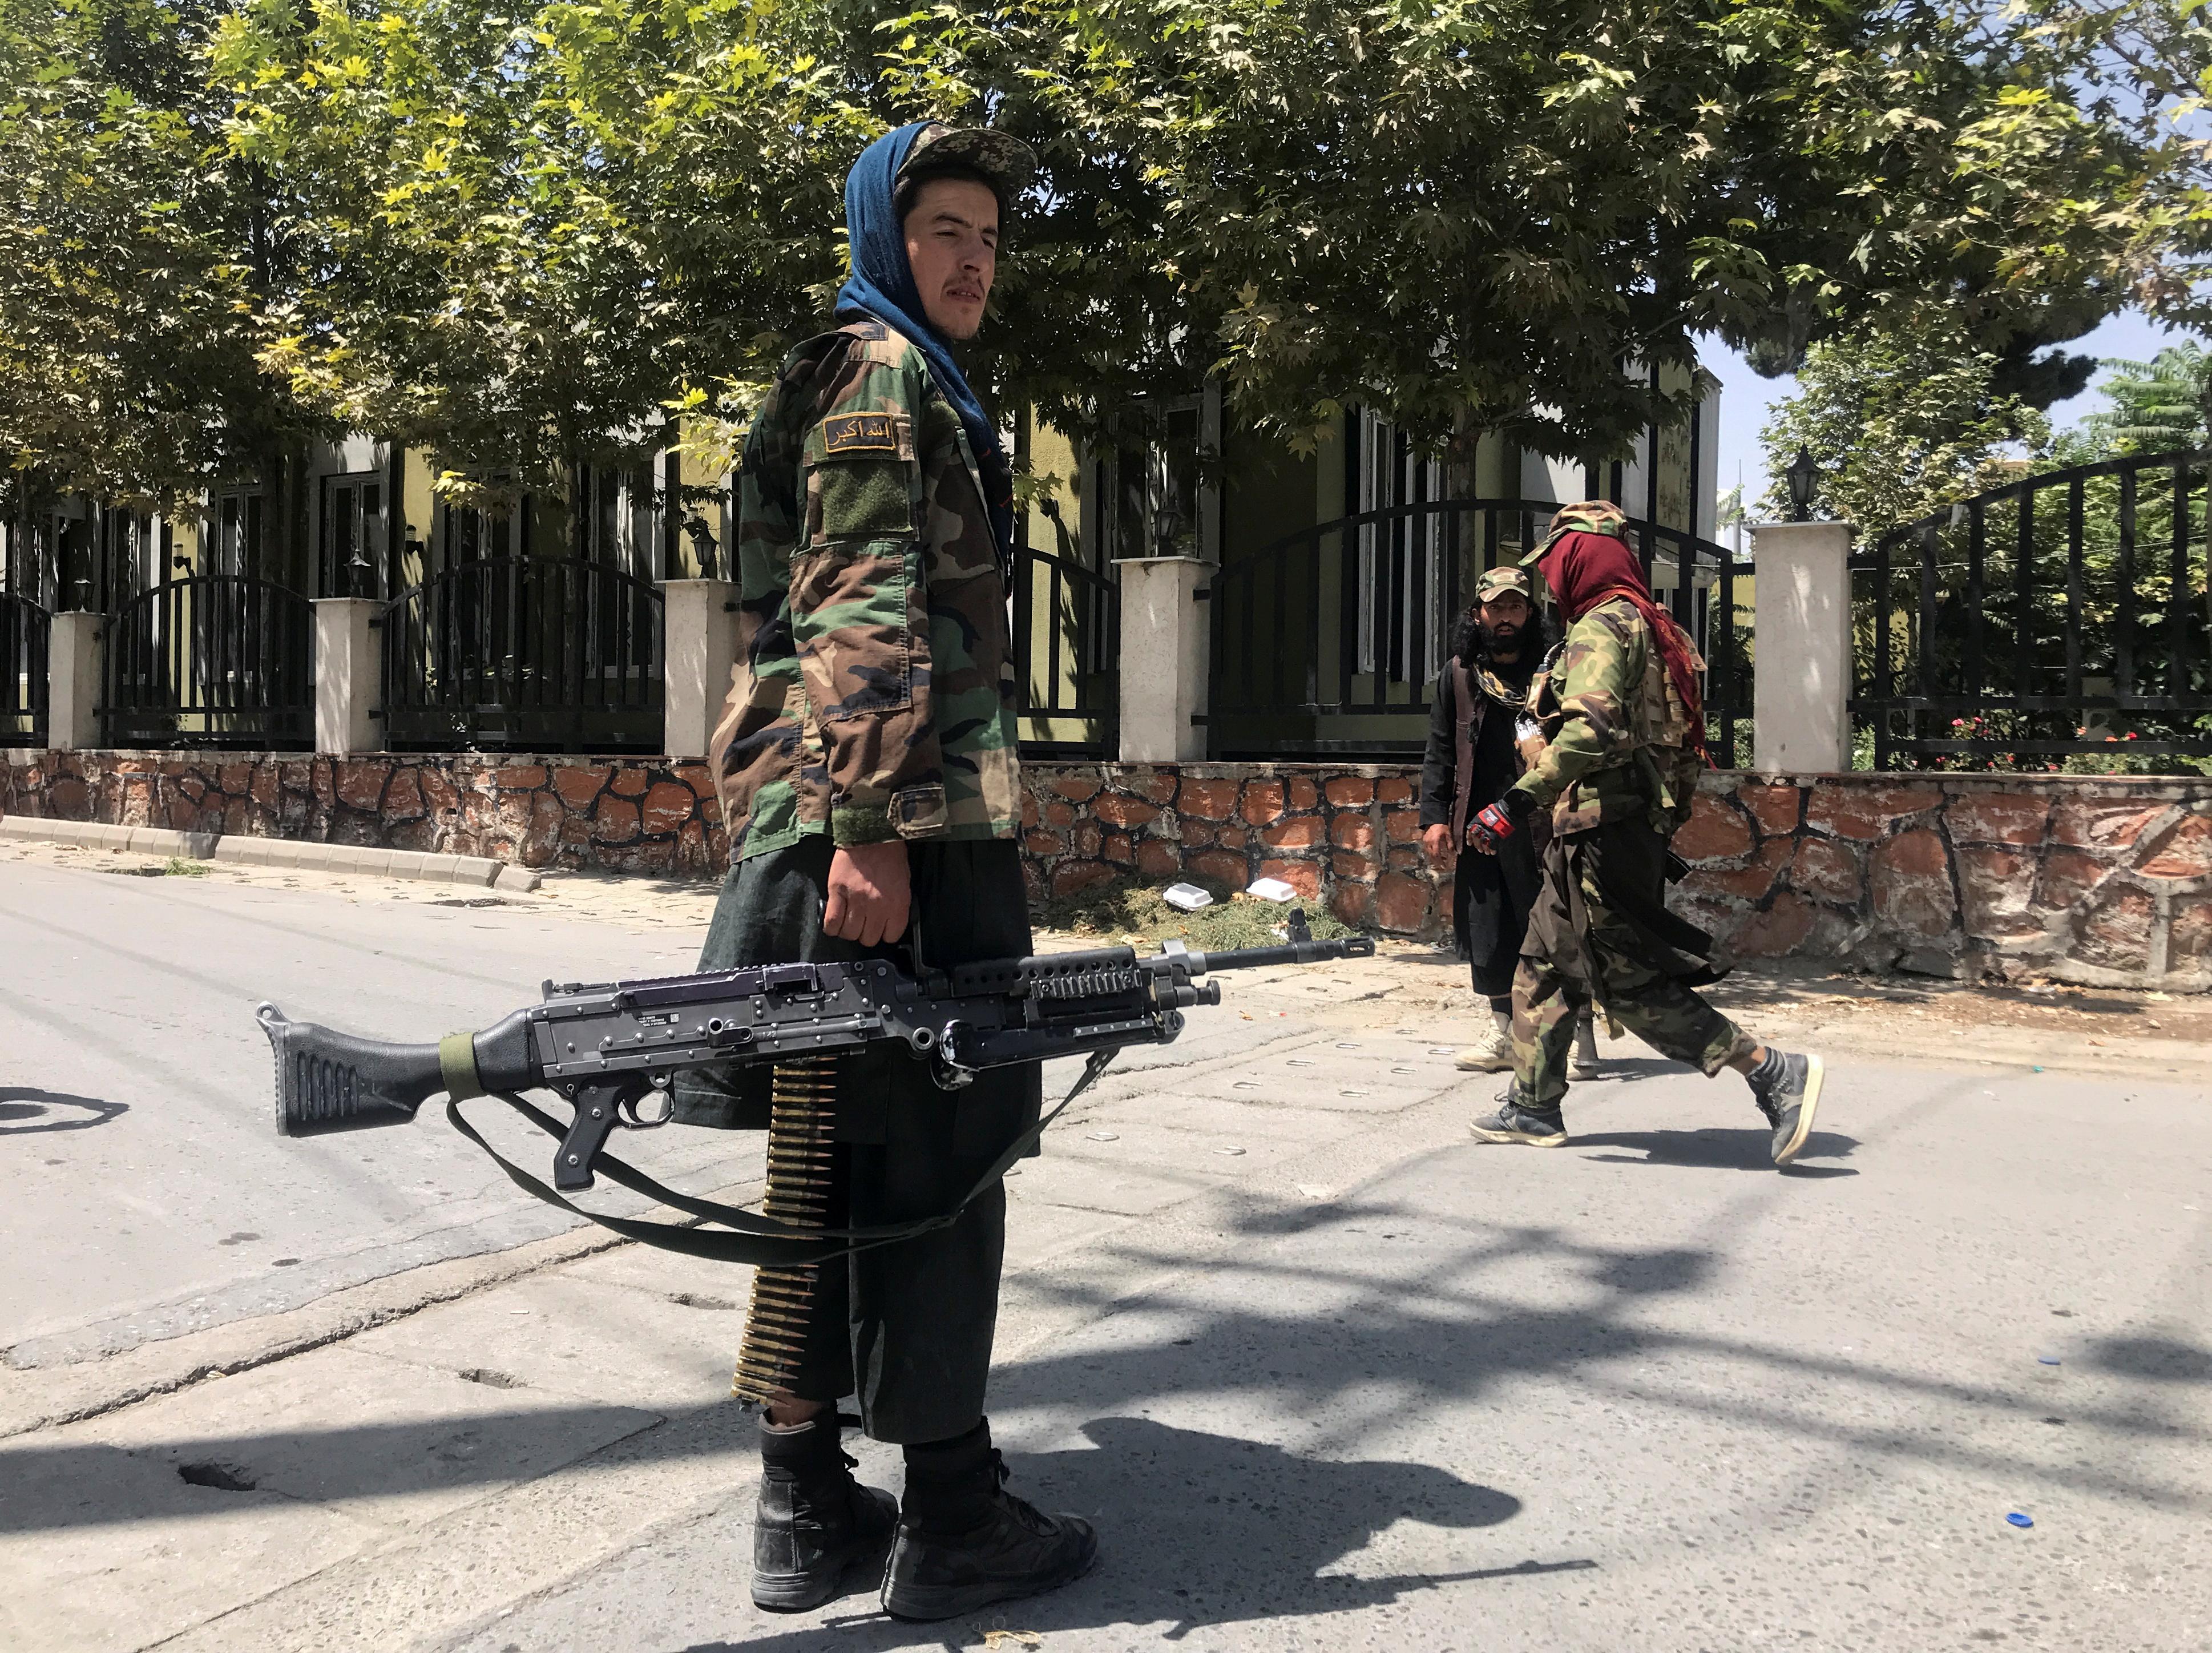 Taliban forces keep watch inside Kabul, Afghanistan August 16, 2021. REUTERS/Stringer